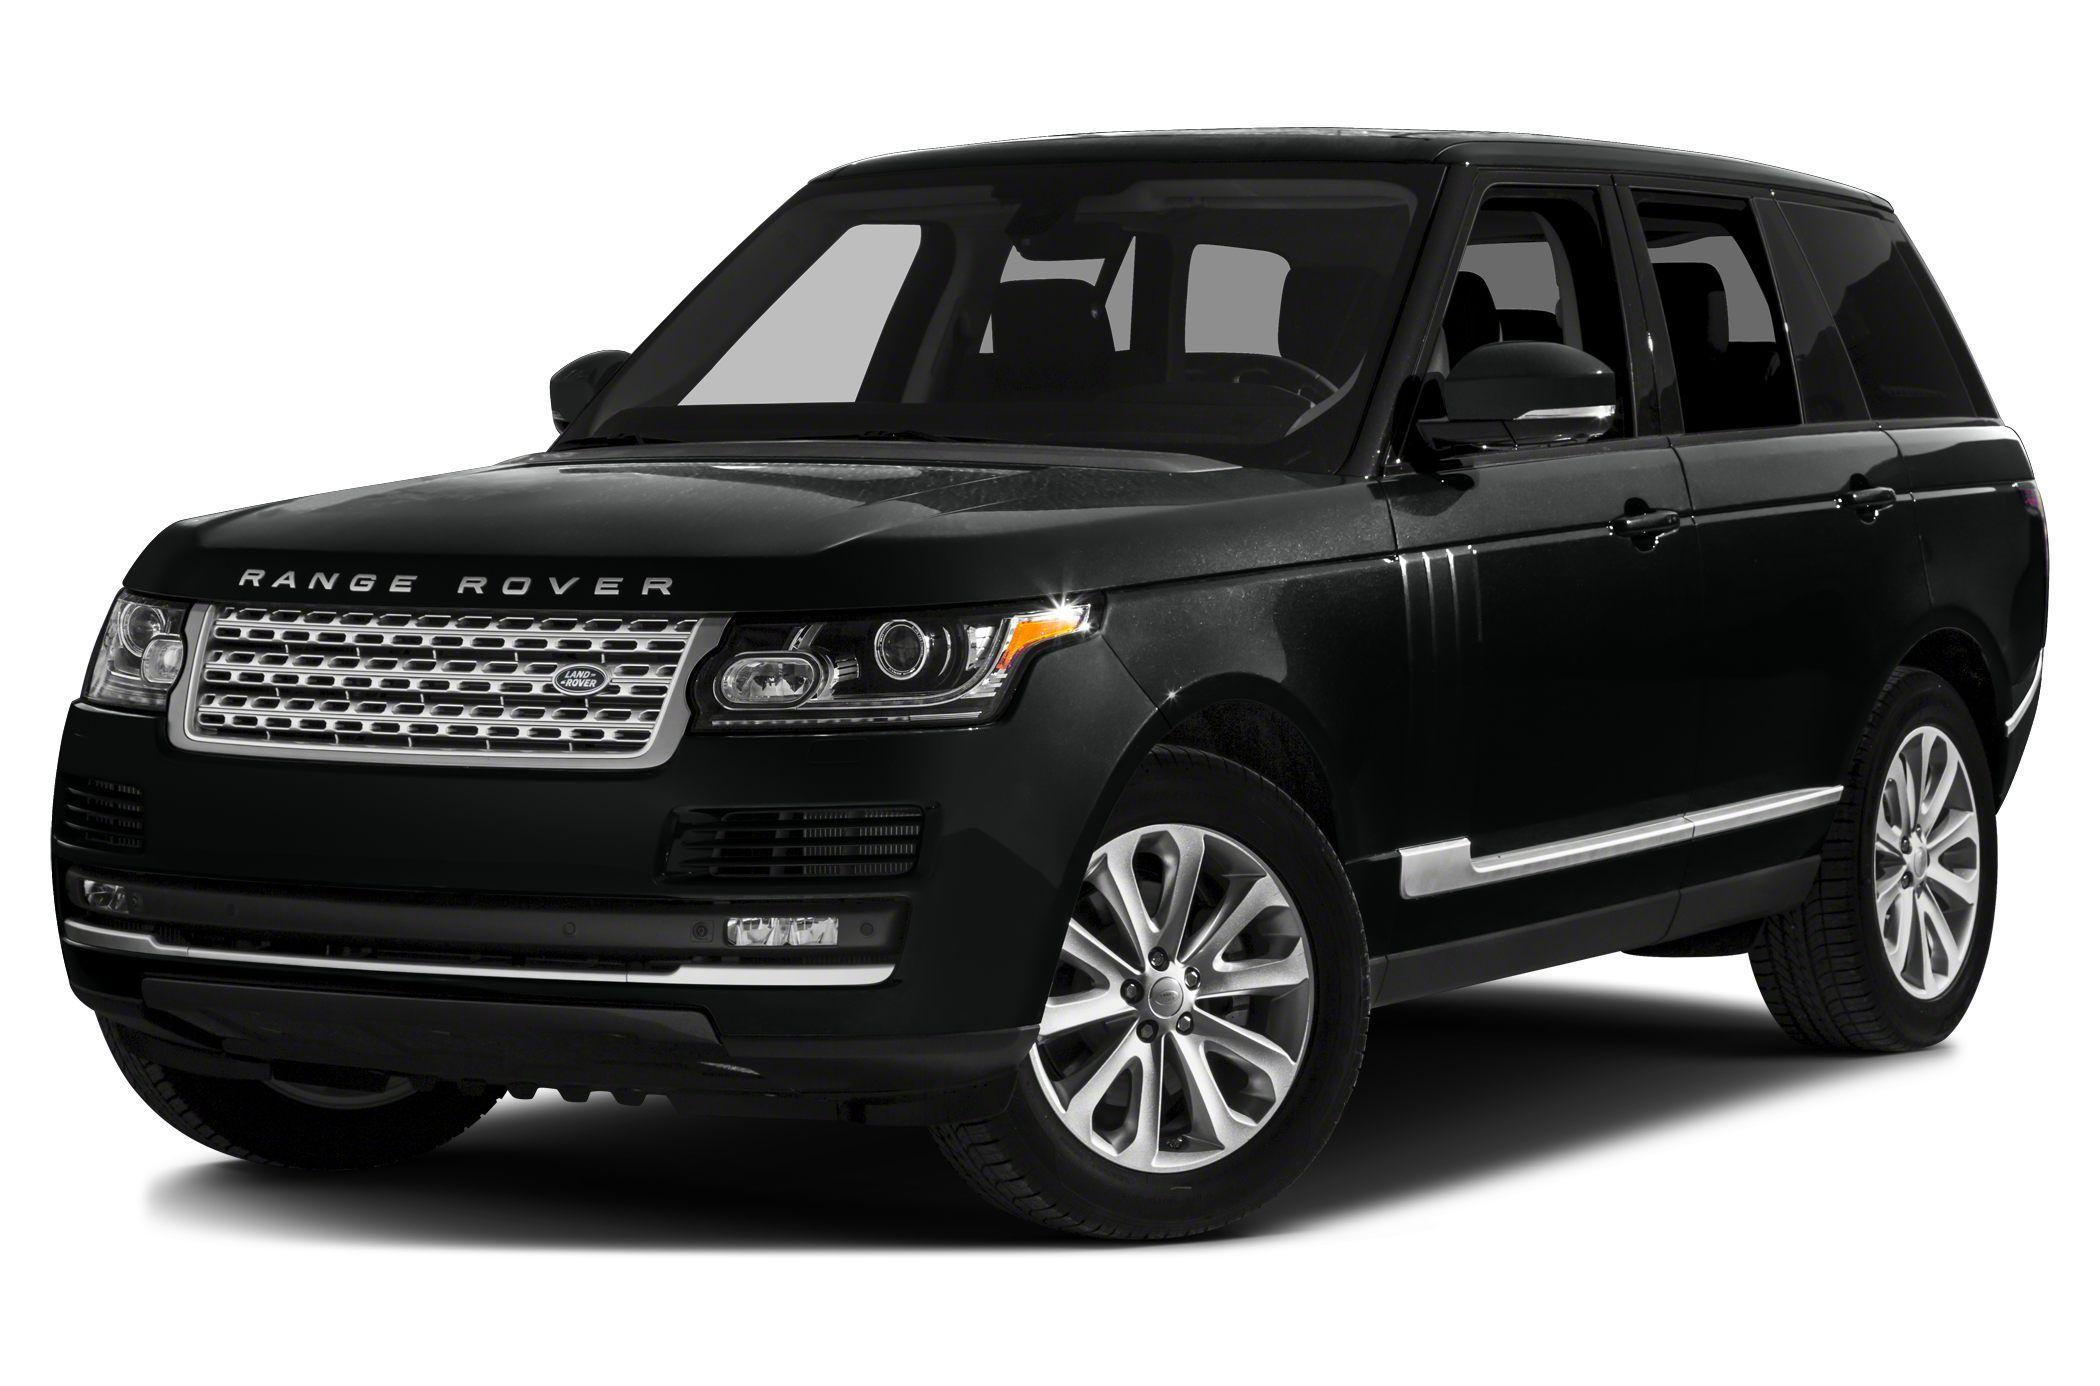 Range Rover Evoque Black Wallpapers High Resolution